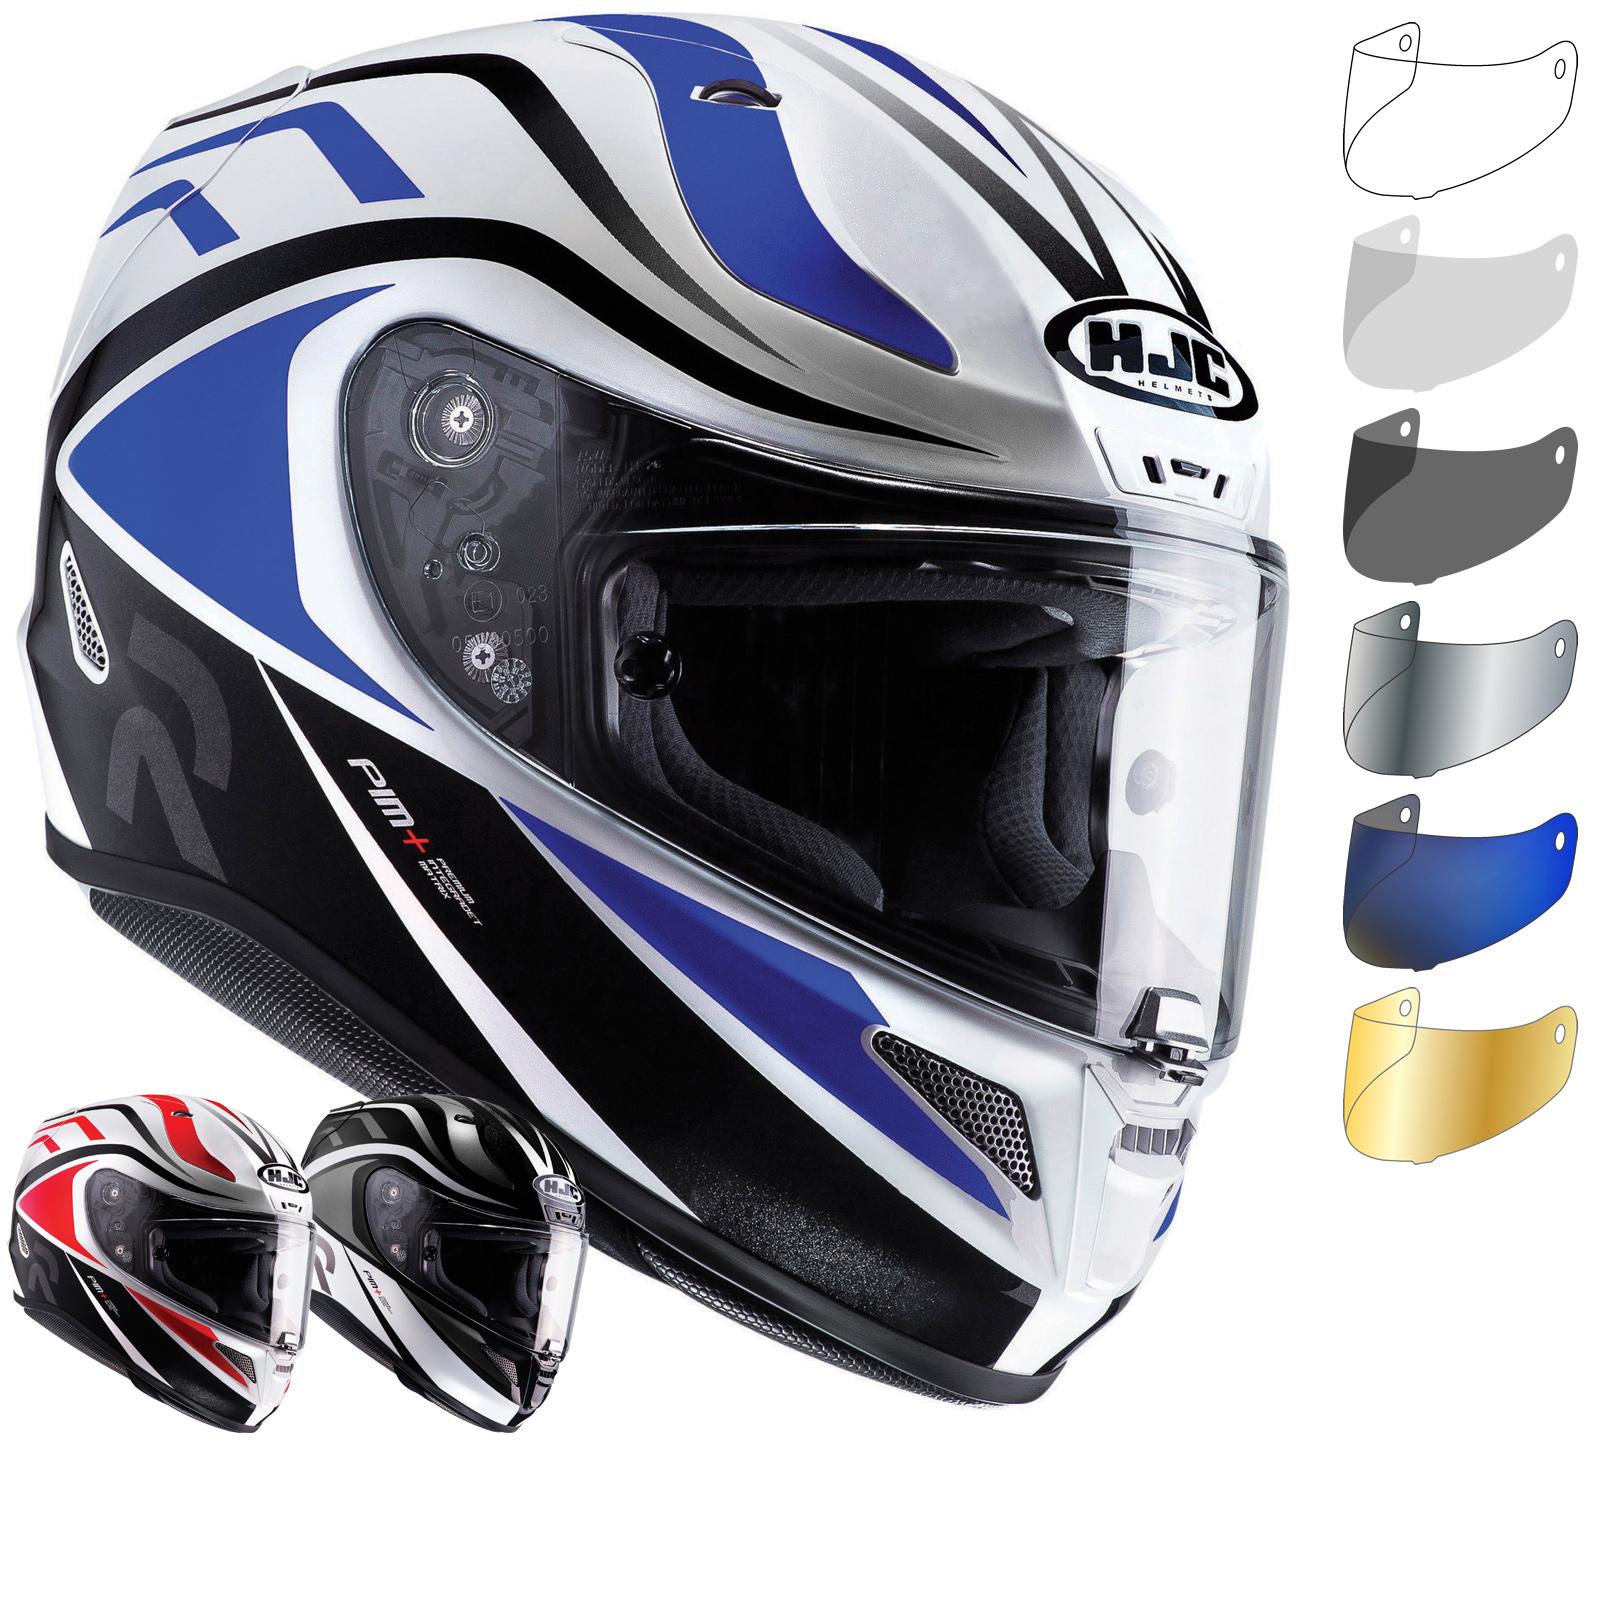 hjc rpha 11 vermo motorcycle helmet visor full face. Black Bedroom Furniture Sets. Home Design Ideas